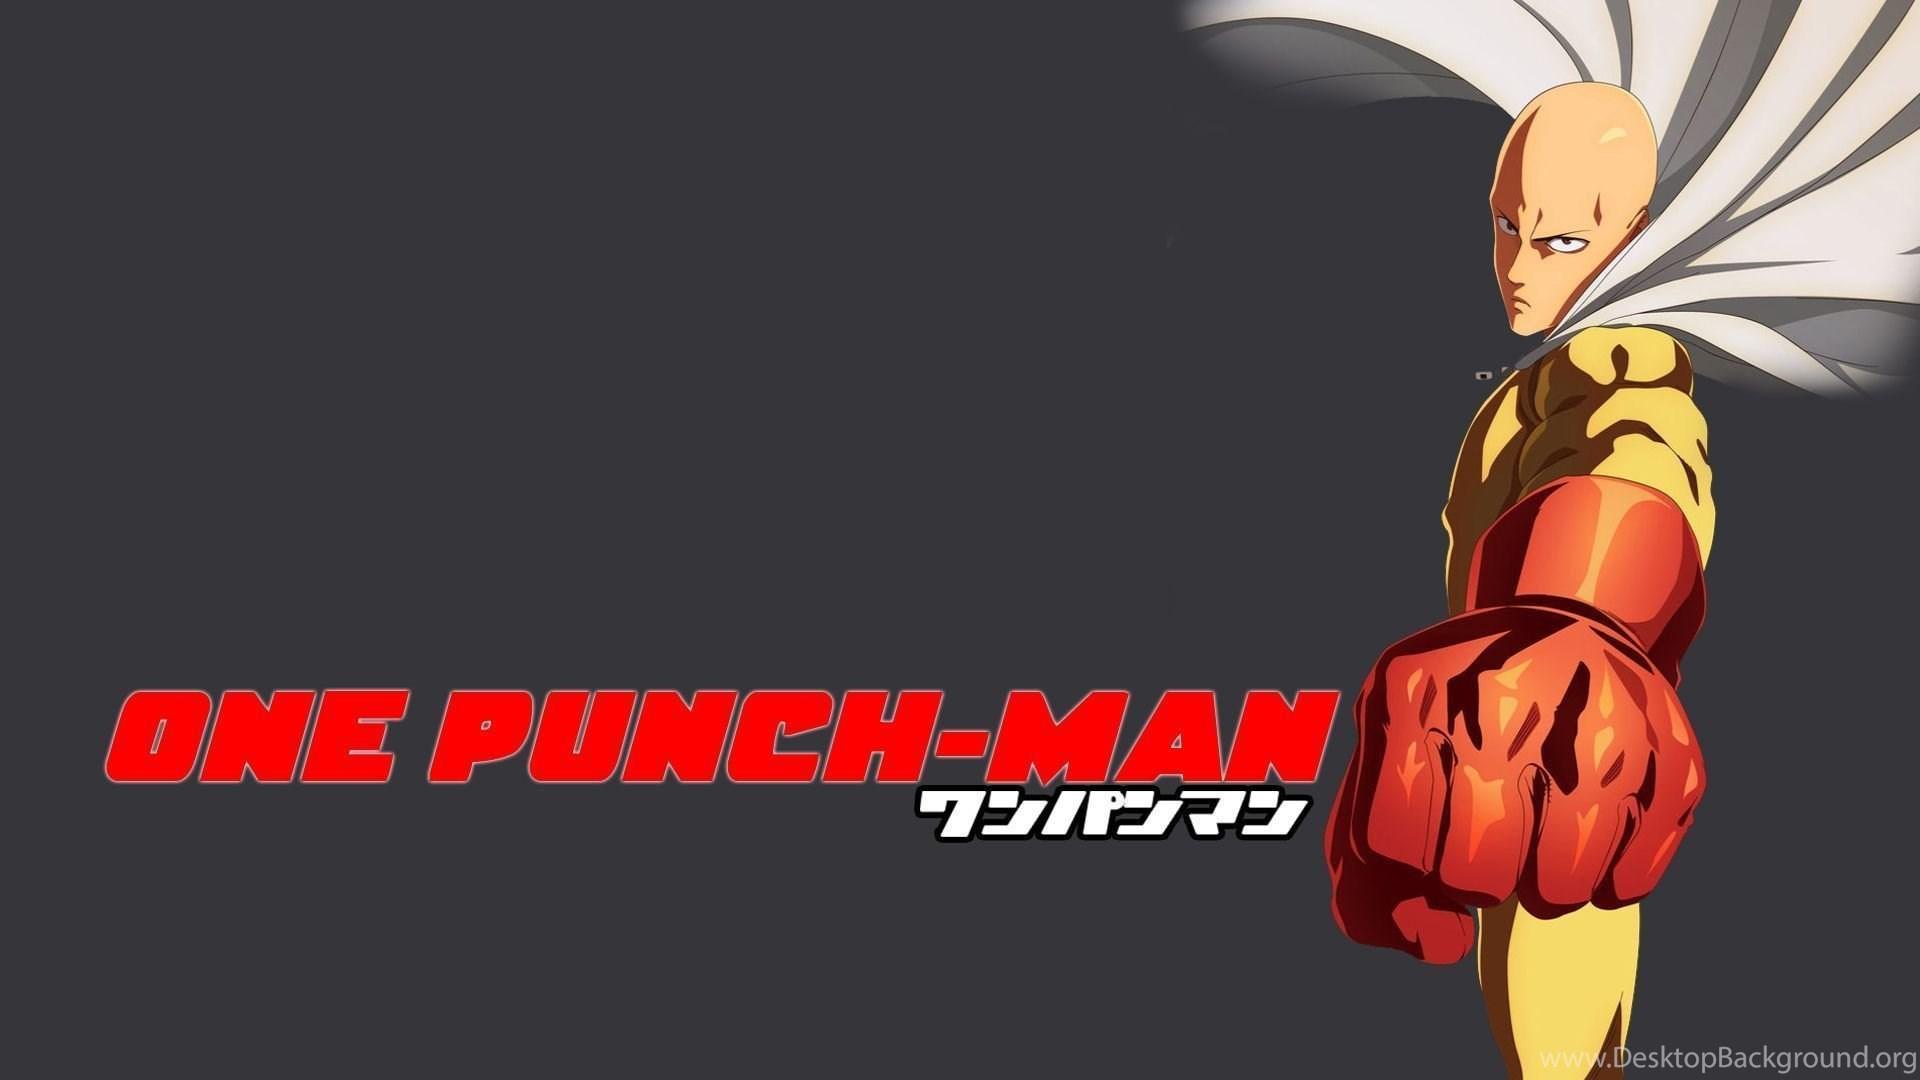 242 One Punch Man Hd Wallpapers Desktop Background